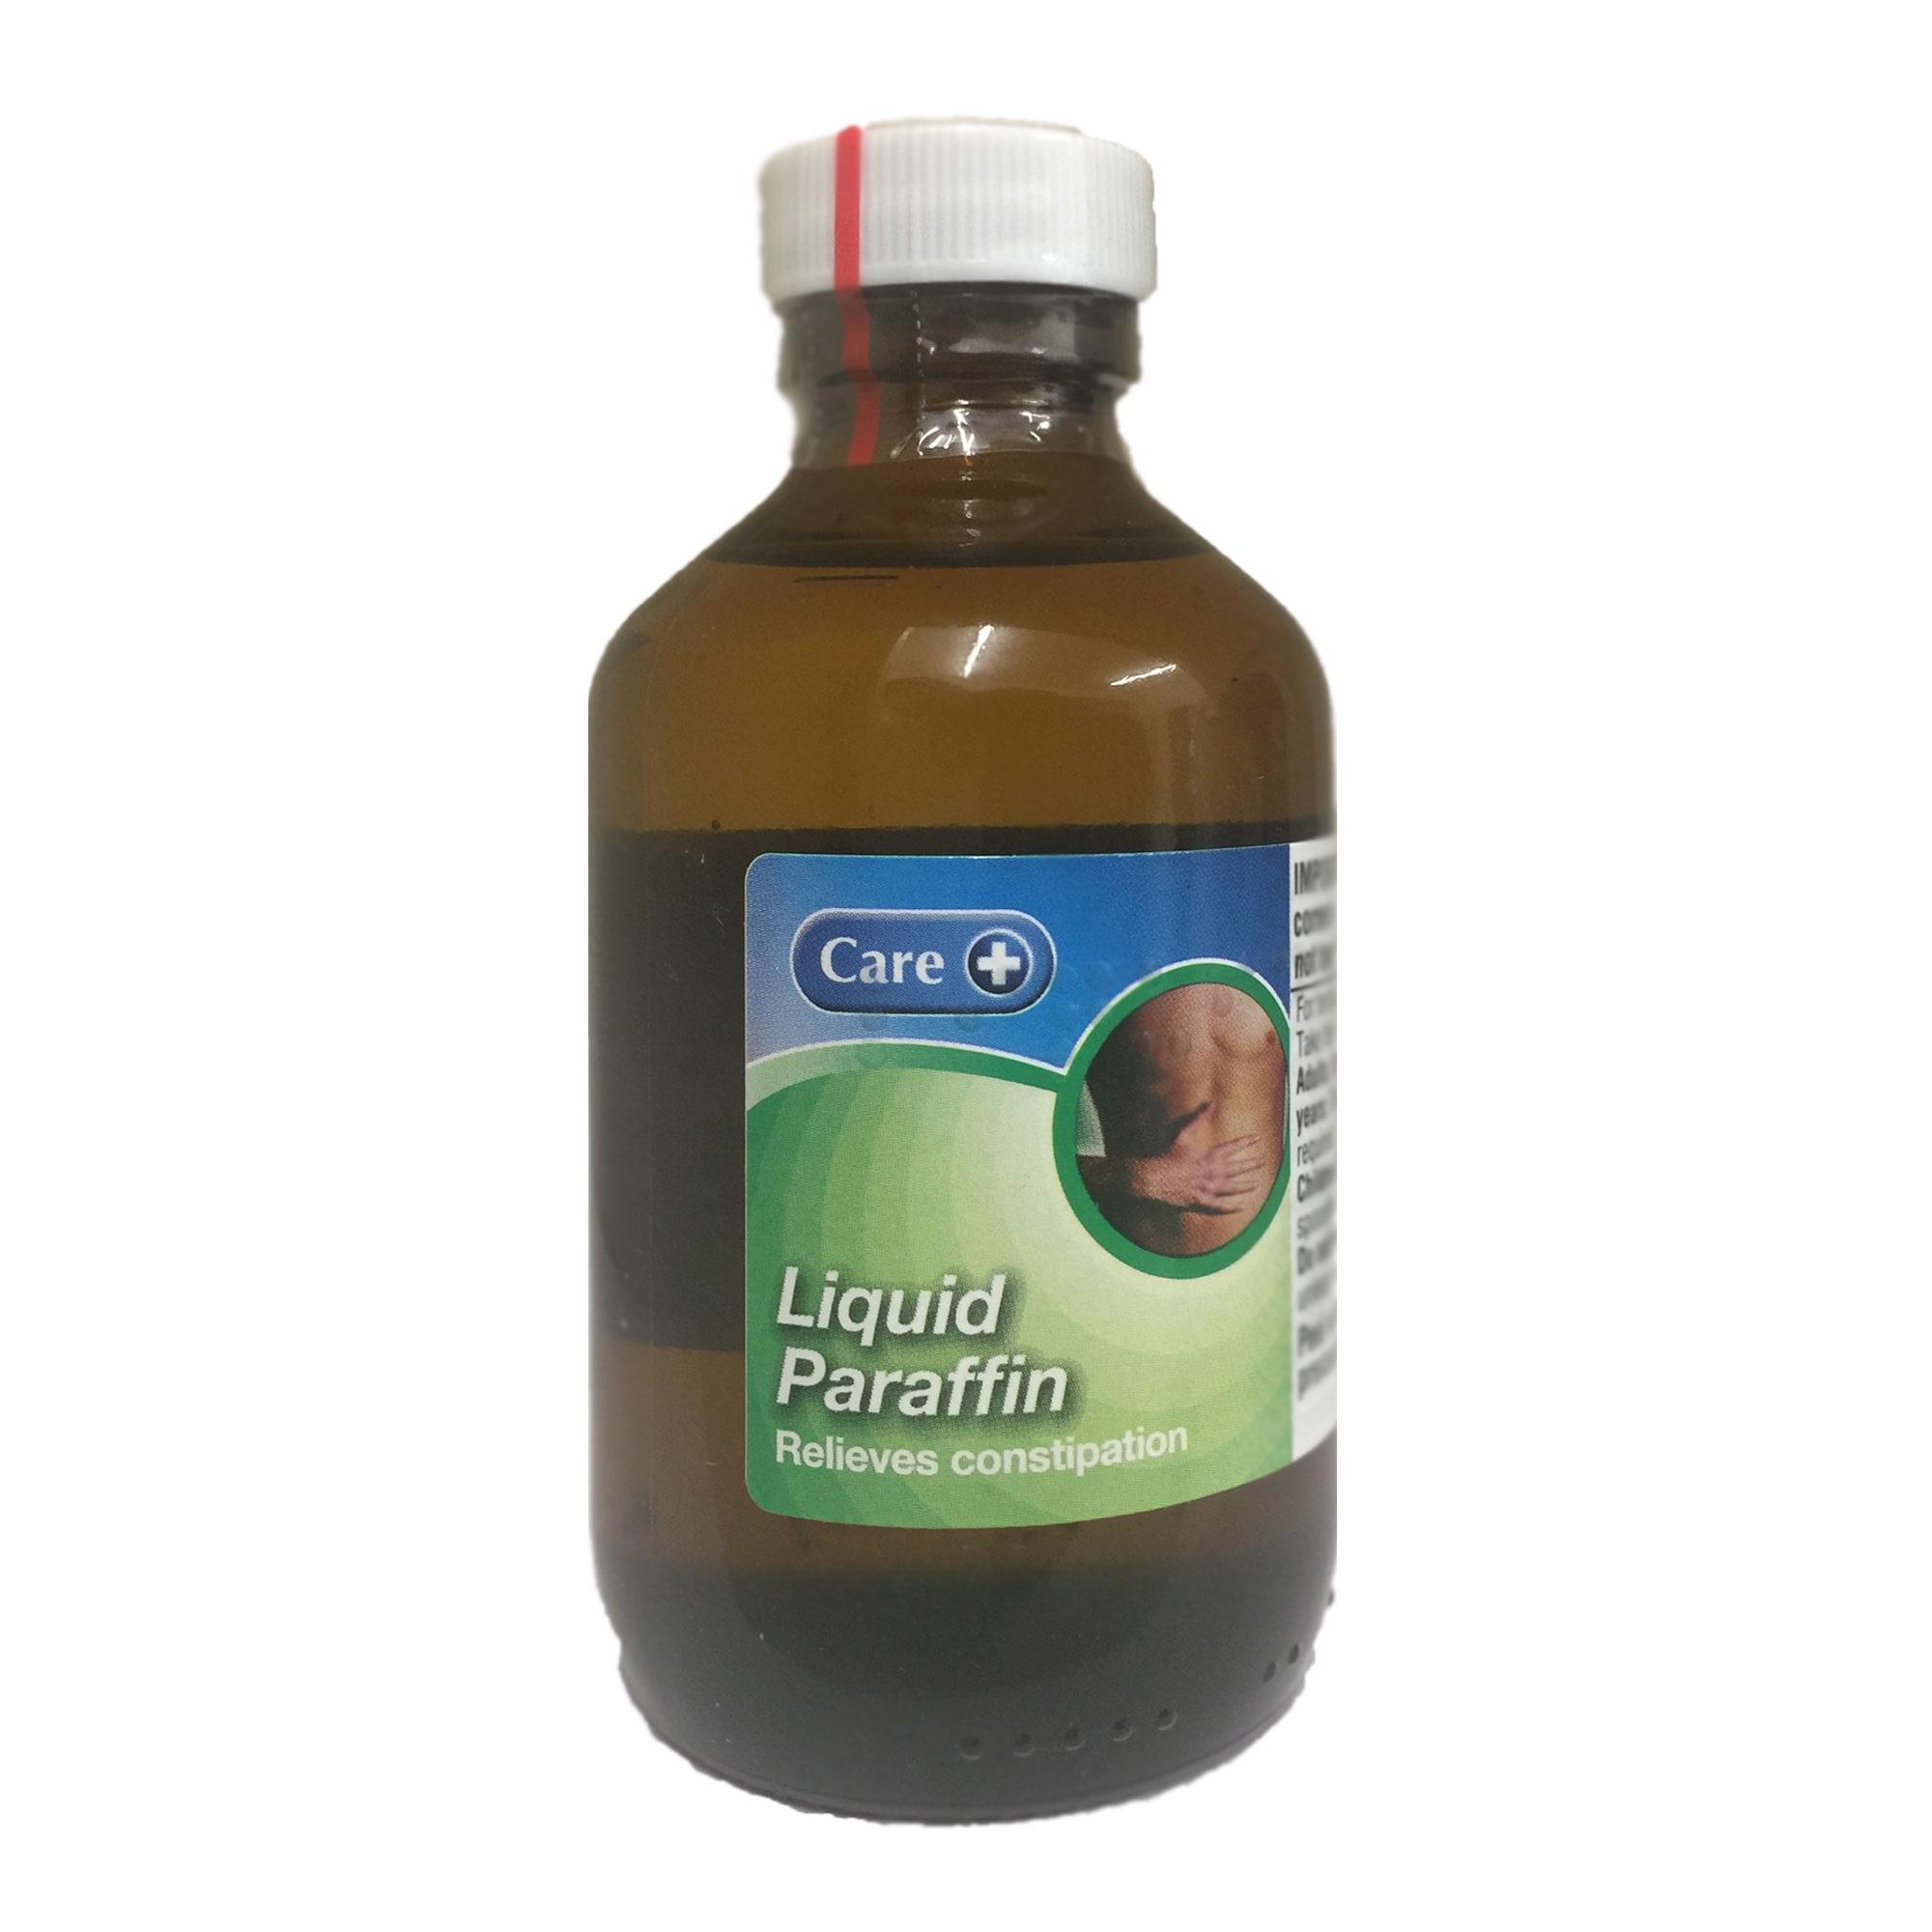 Care Liquid Paraffin for Effective Constipation Relief 150ml ... for liquid paraffin for constipation  156eri